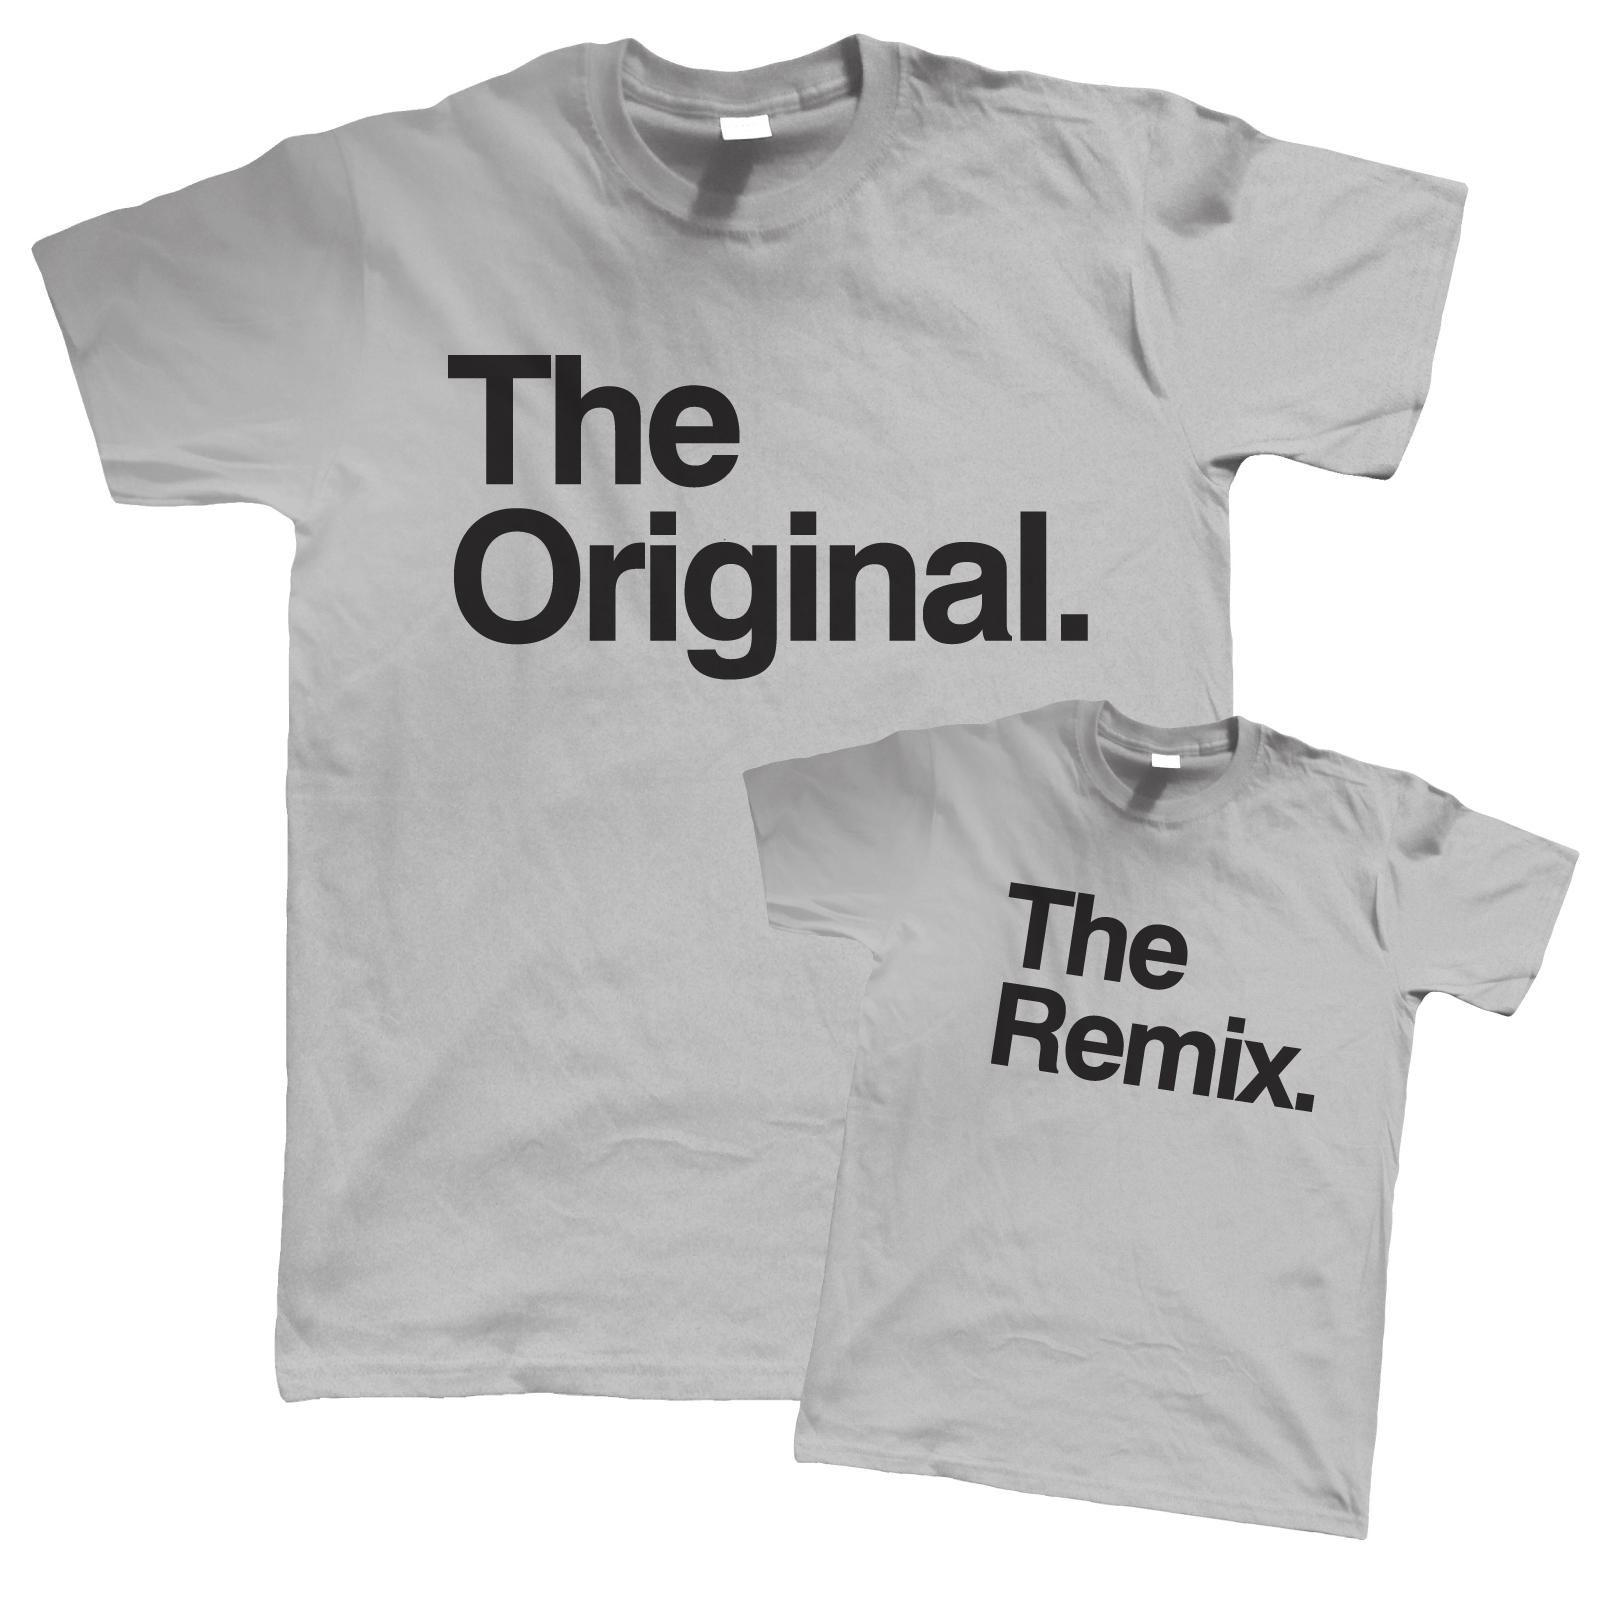 The Original. L'originale. The Remix. Il Remix. Father Son Gif T-shirt Padre Figlio Gif T-shirt K2fIf